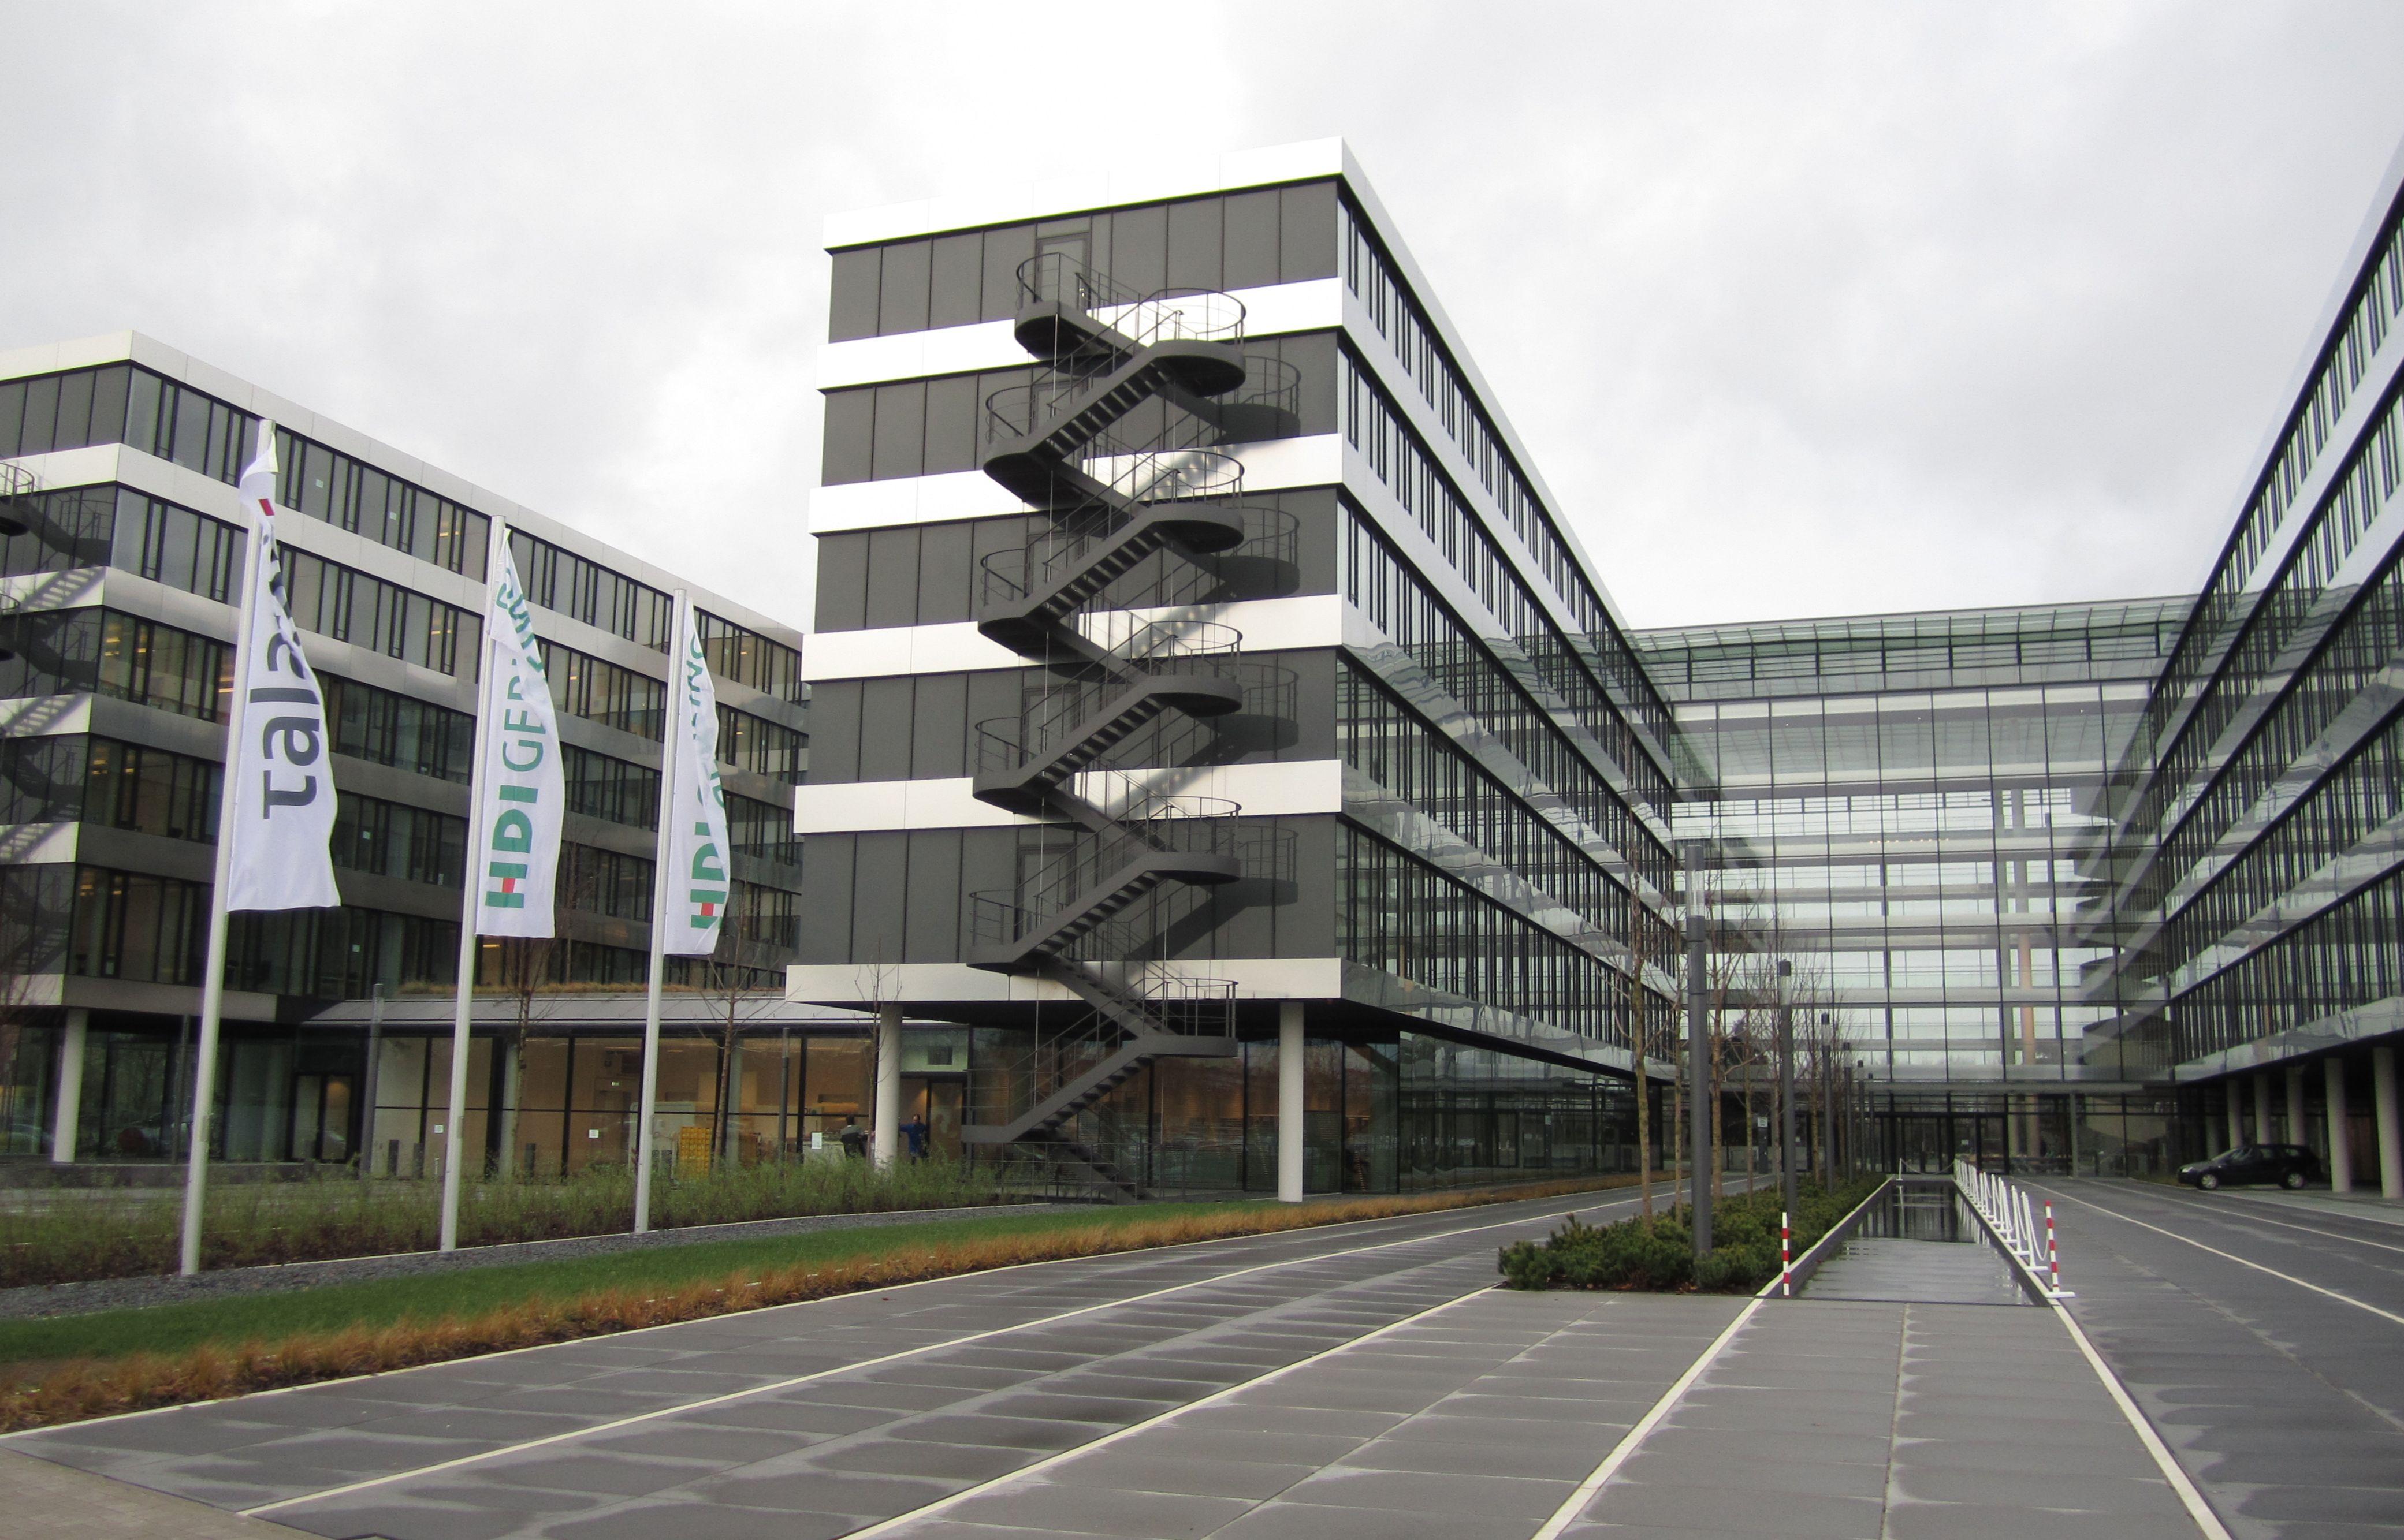 Hdi Versicherung Hannover - calendrier